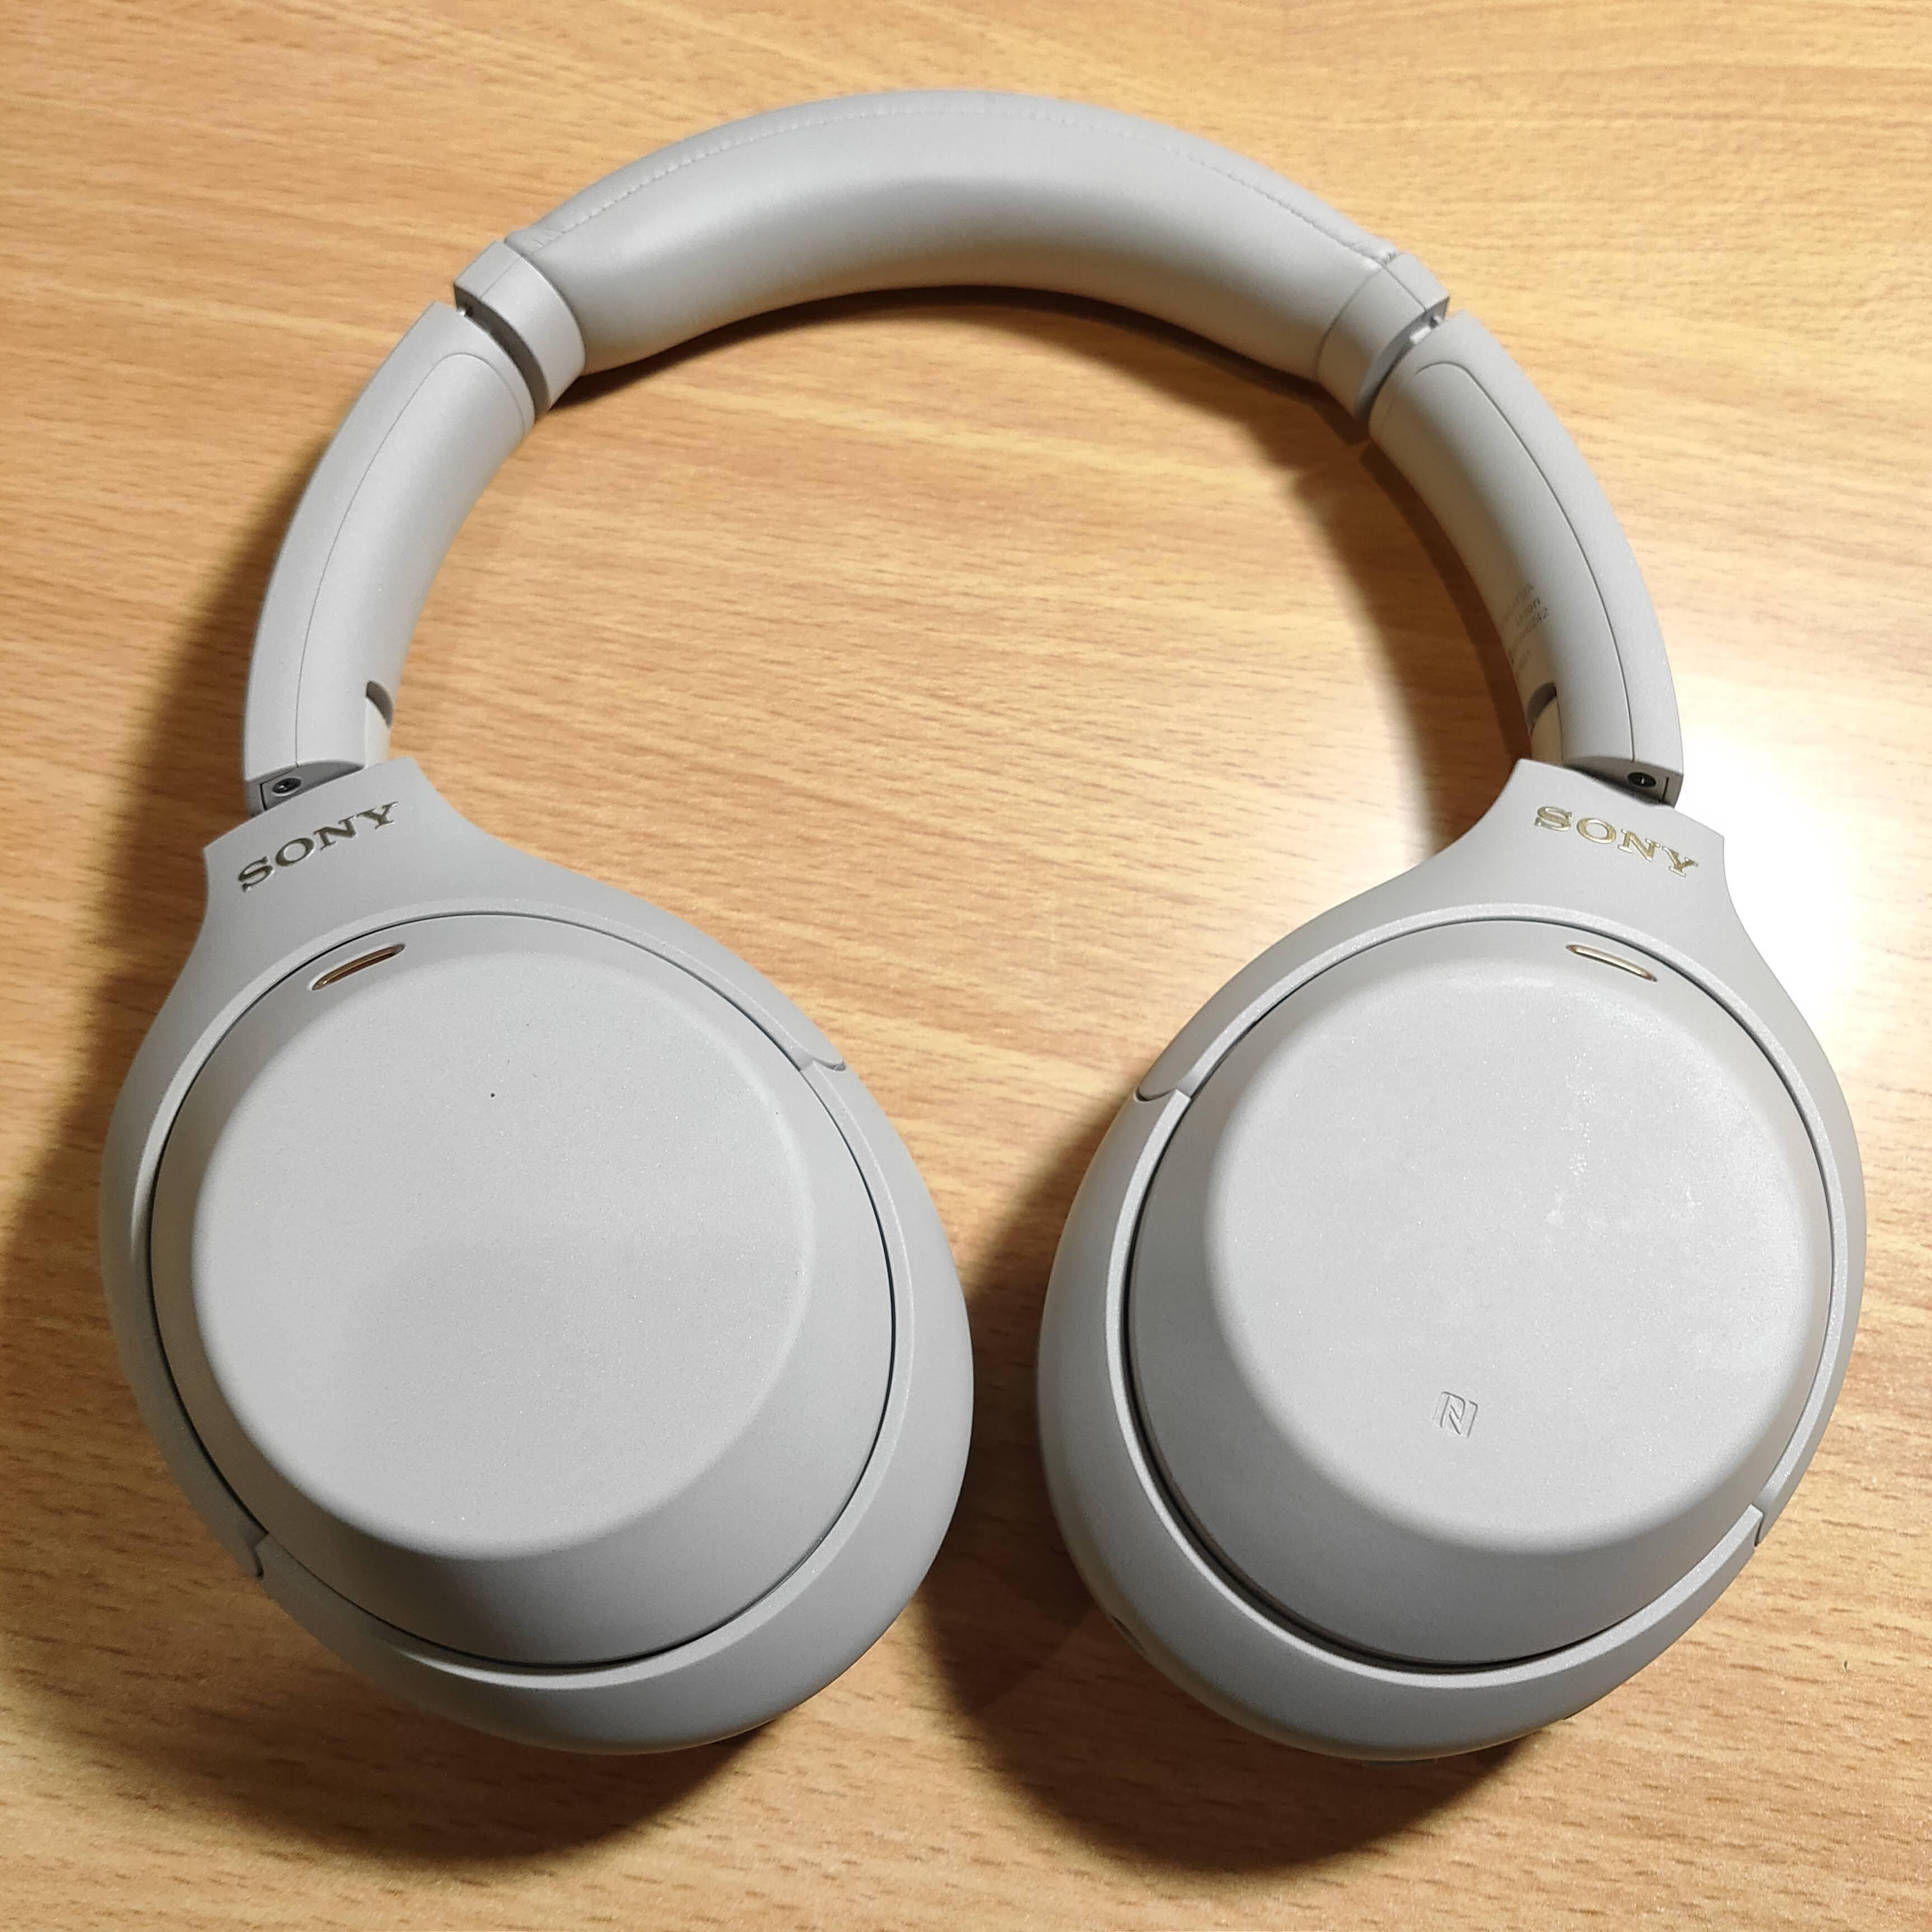 SONY WH-1000XM4 ワイヤレスノイズキャンセリングヘッドフォン